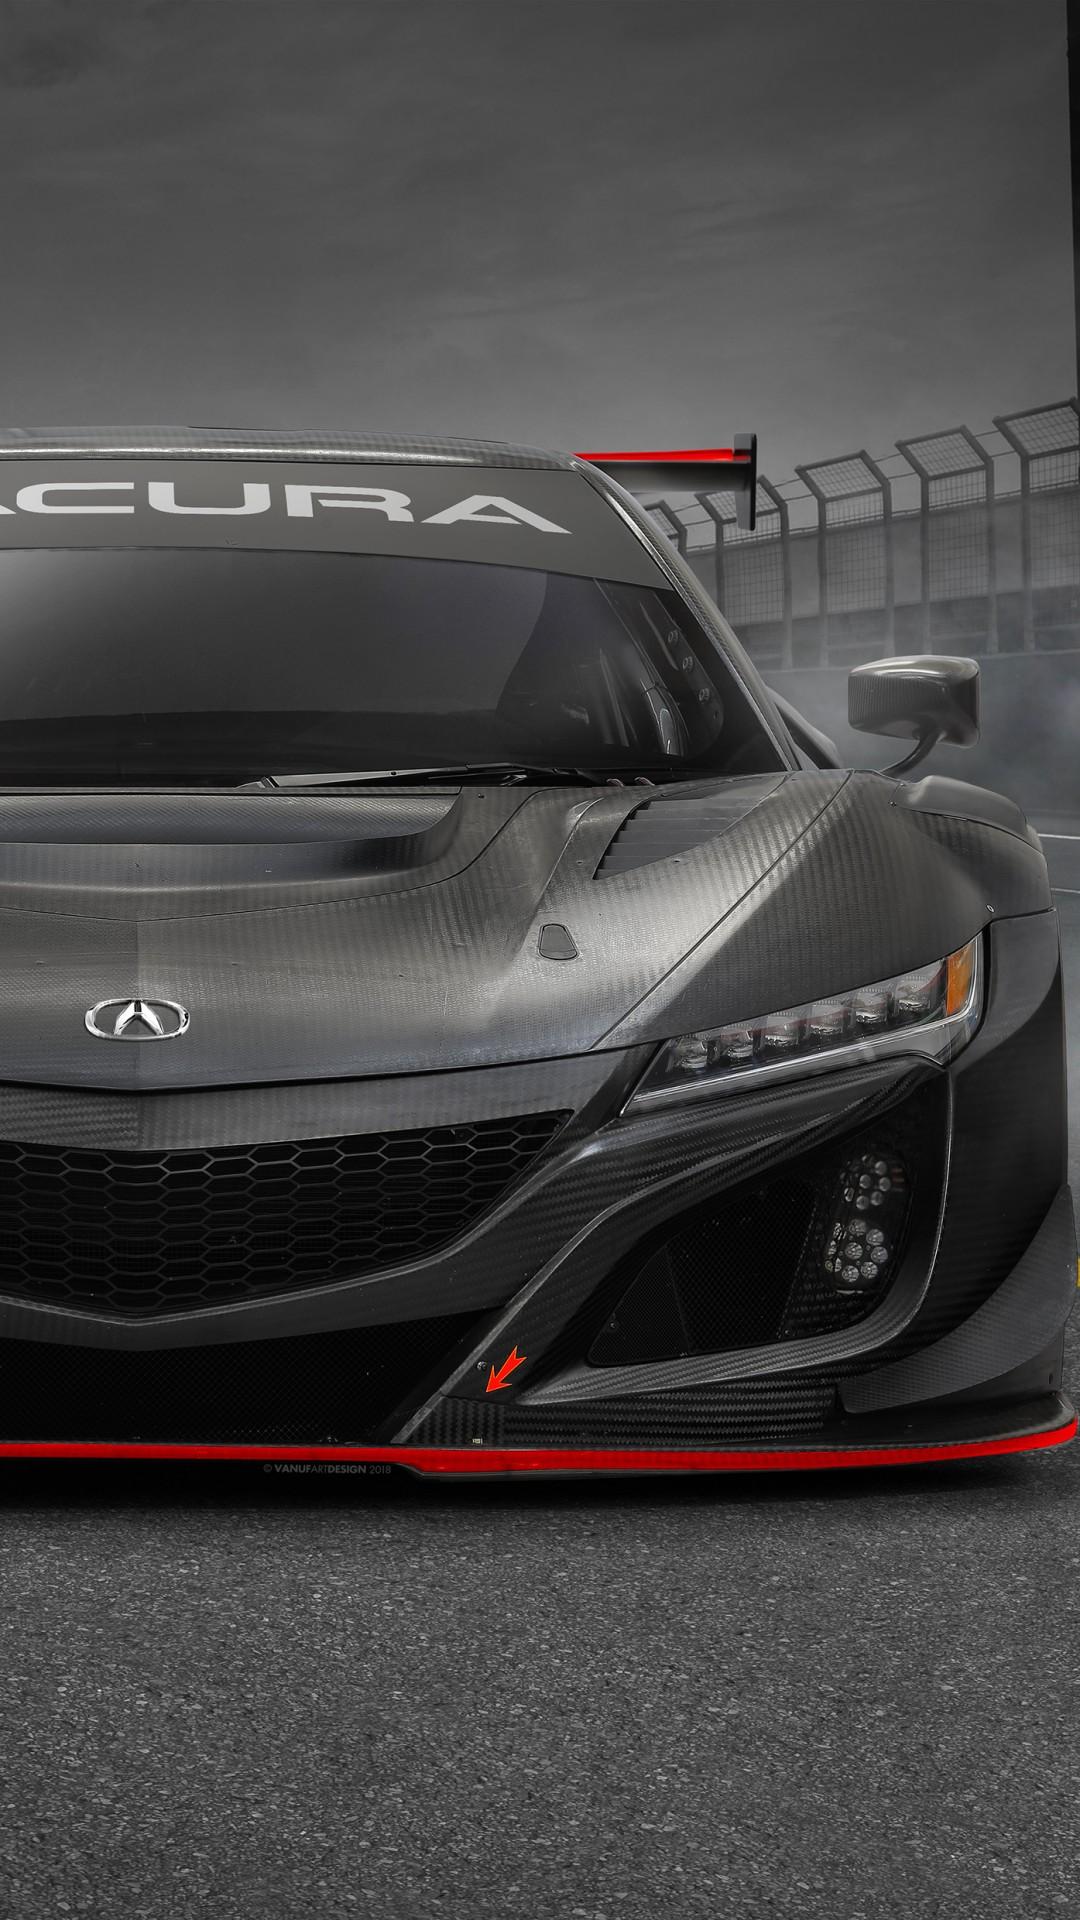 wallpaper acura nsx gt3 evo  2019 cars  supercar  4k  cars  u0026 bikes  20698